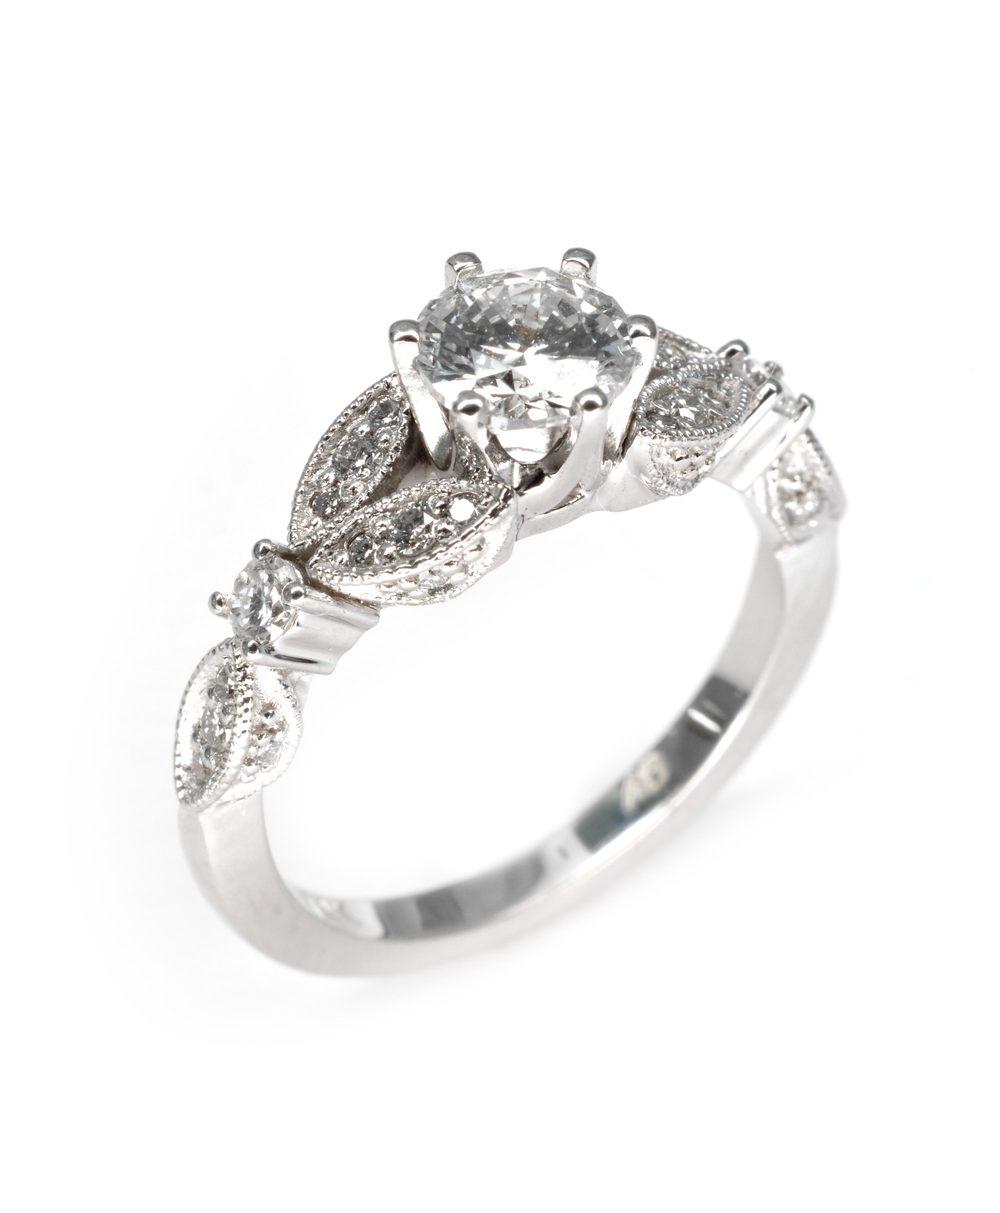 Custom Engagement Rings & Wedding Bands — The Gem Vault